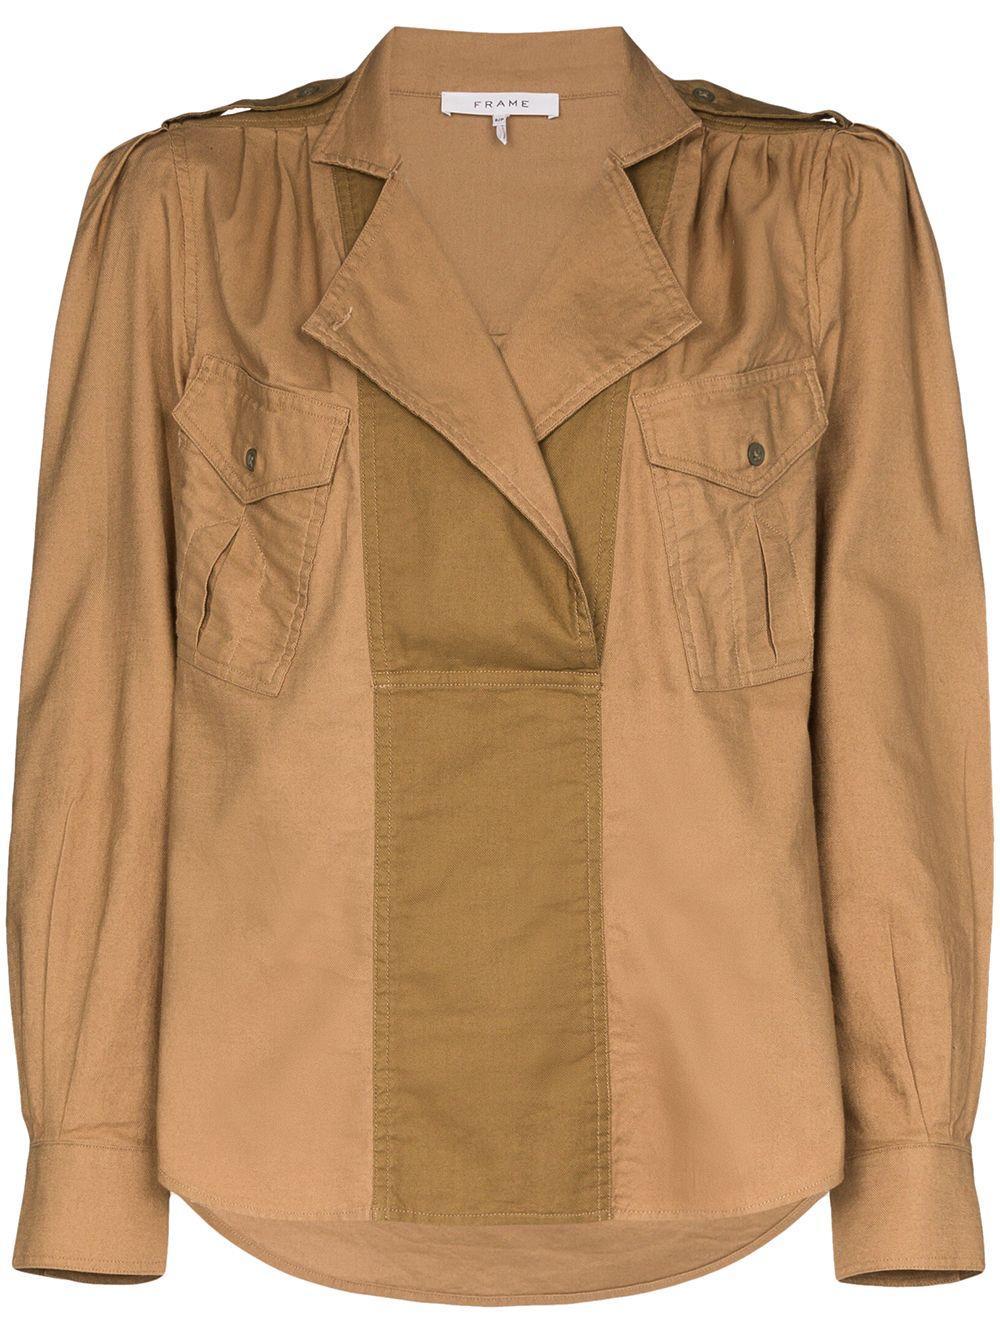 Safari Pocket Long Sleeve Top